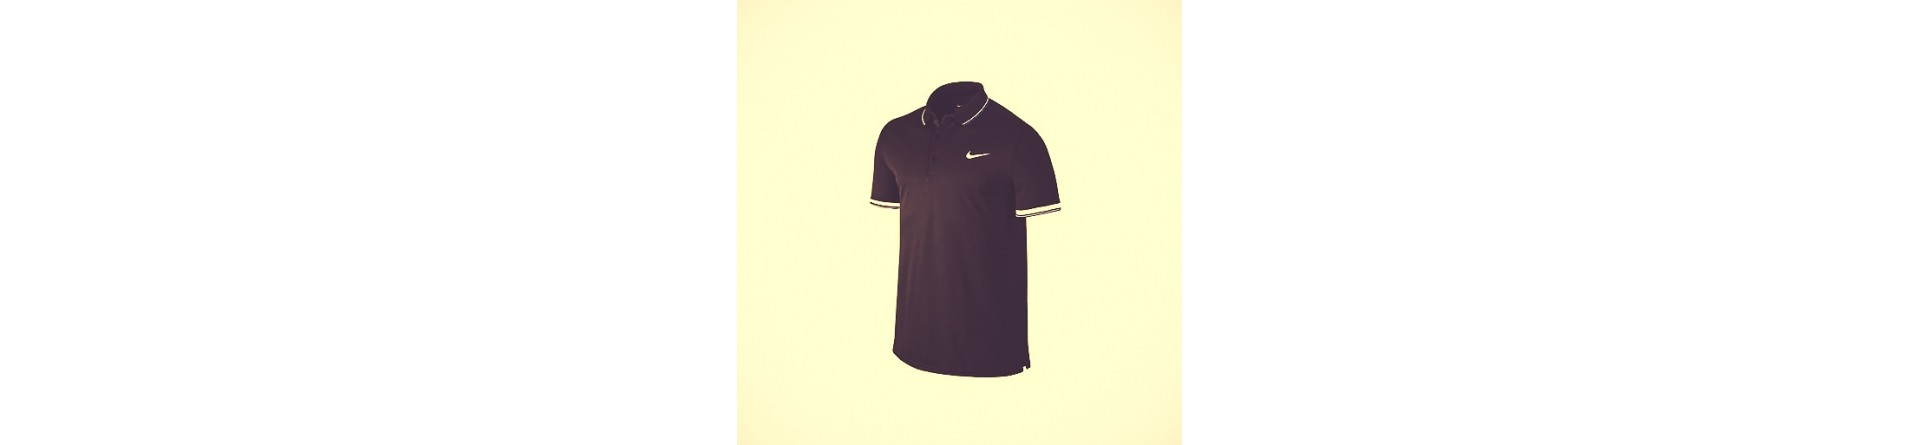 Abbigliamento Tennis | Giuglar Shop